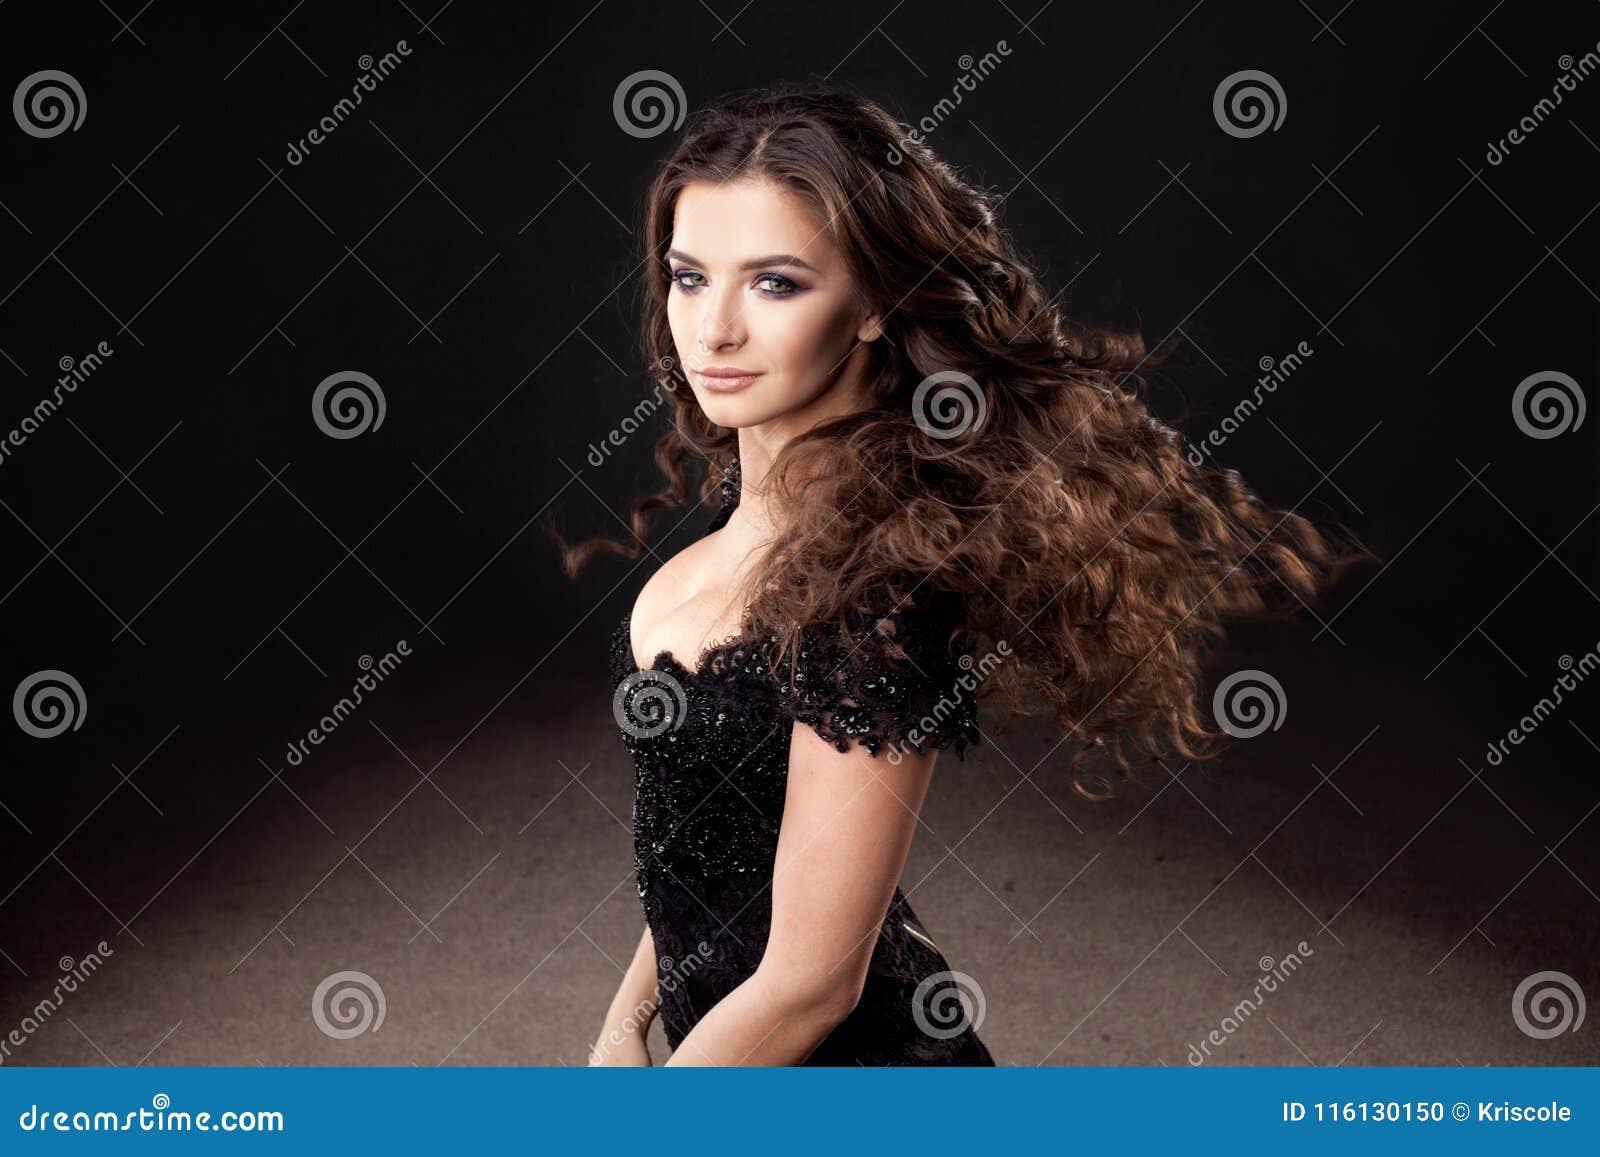 Gorgeous brunette girl in elegant black dress. Beautiful long curly hair.